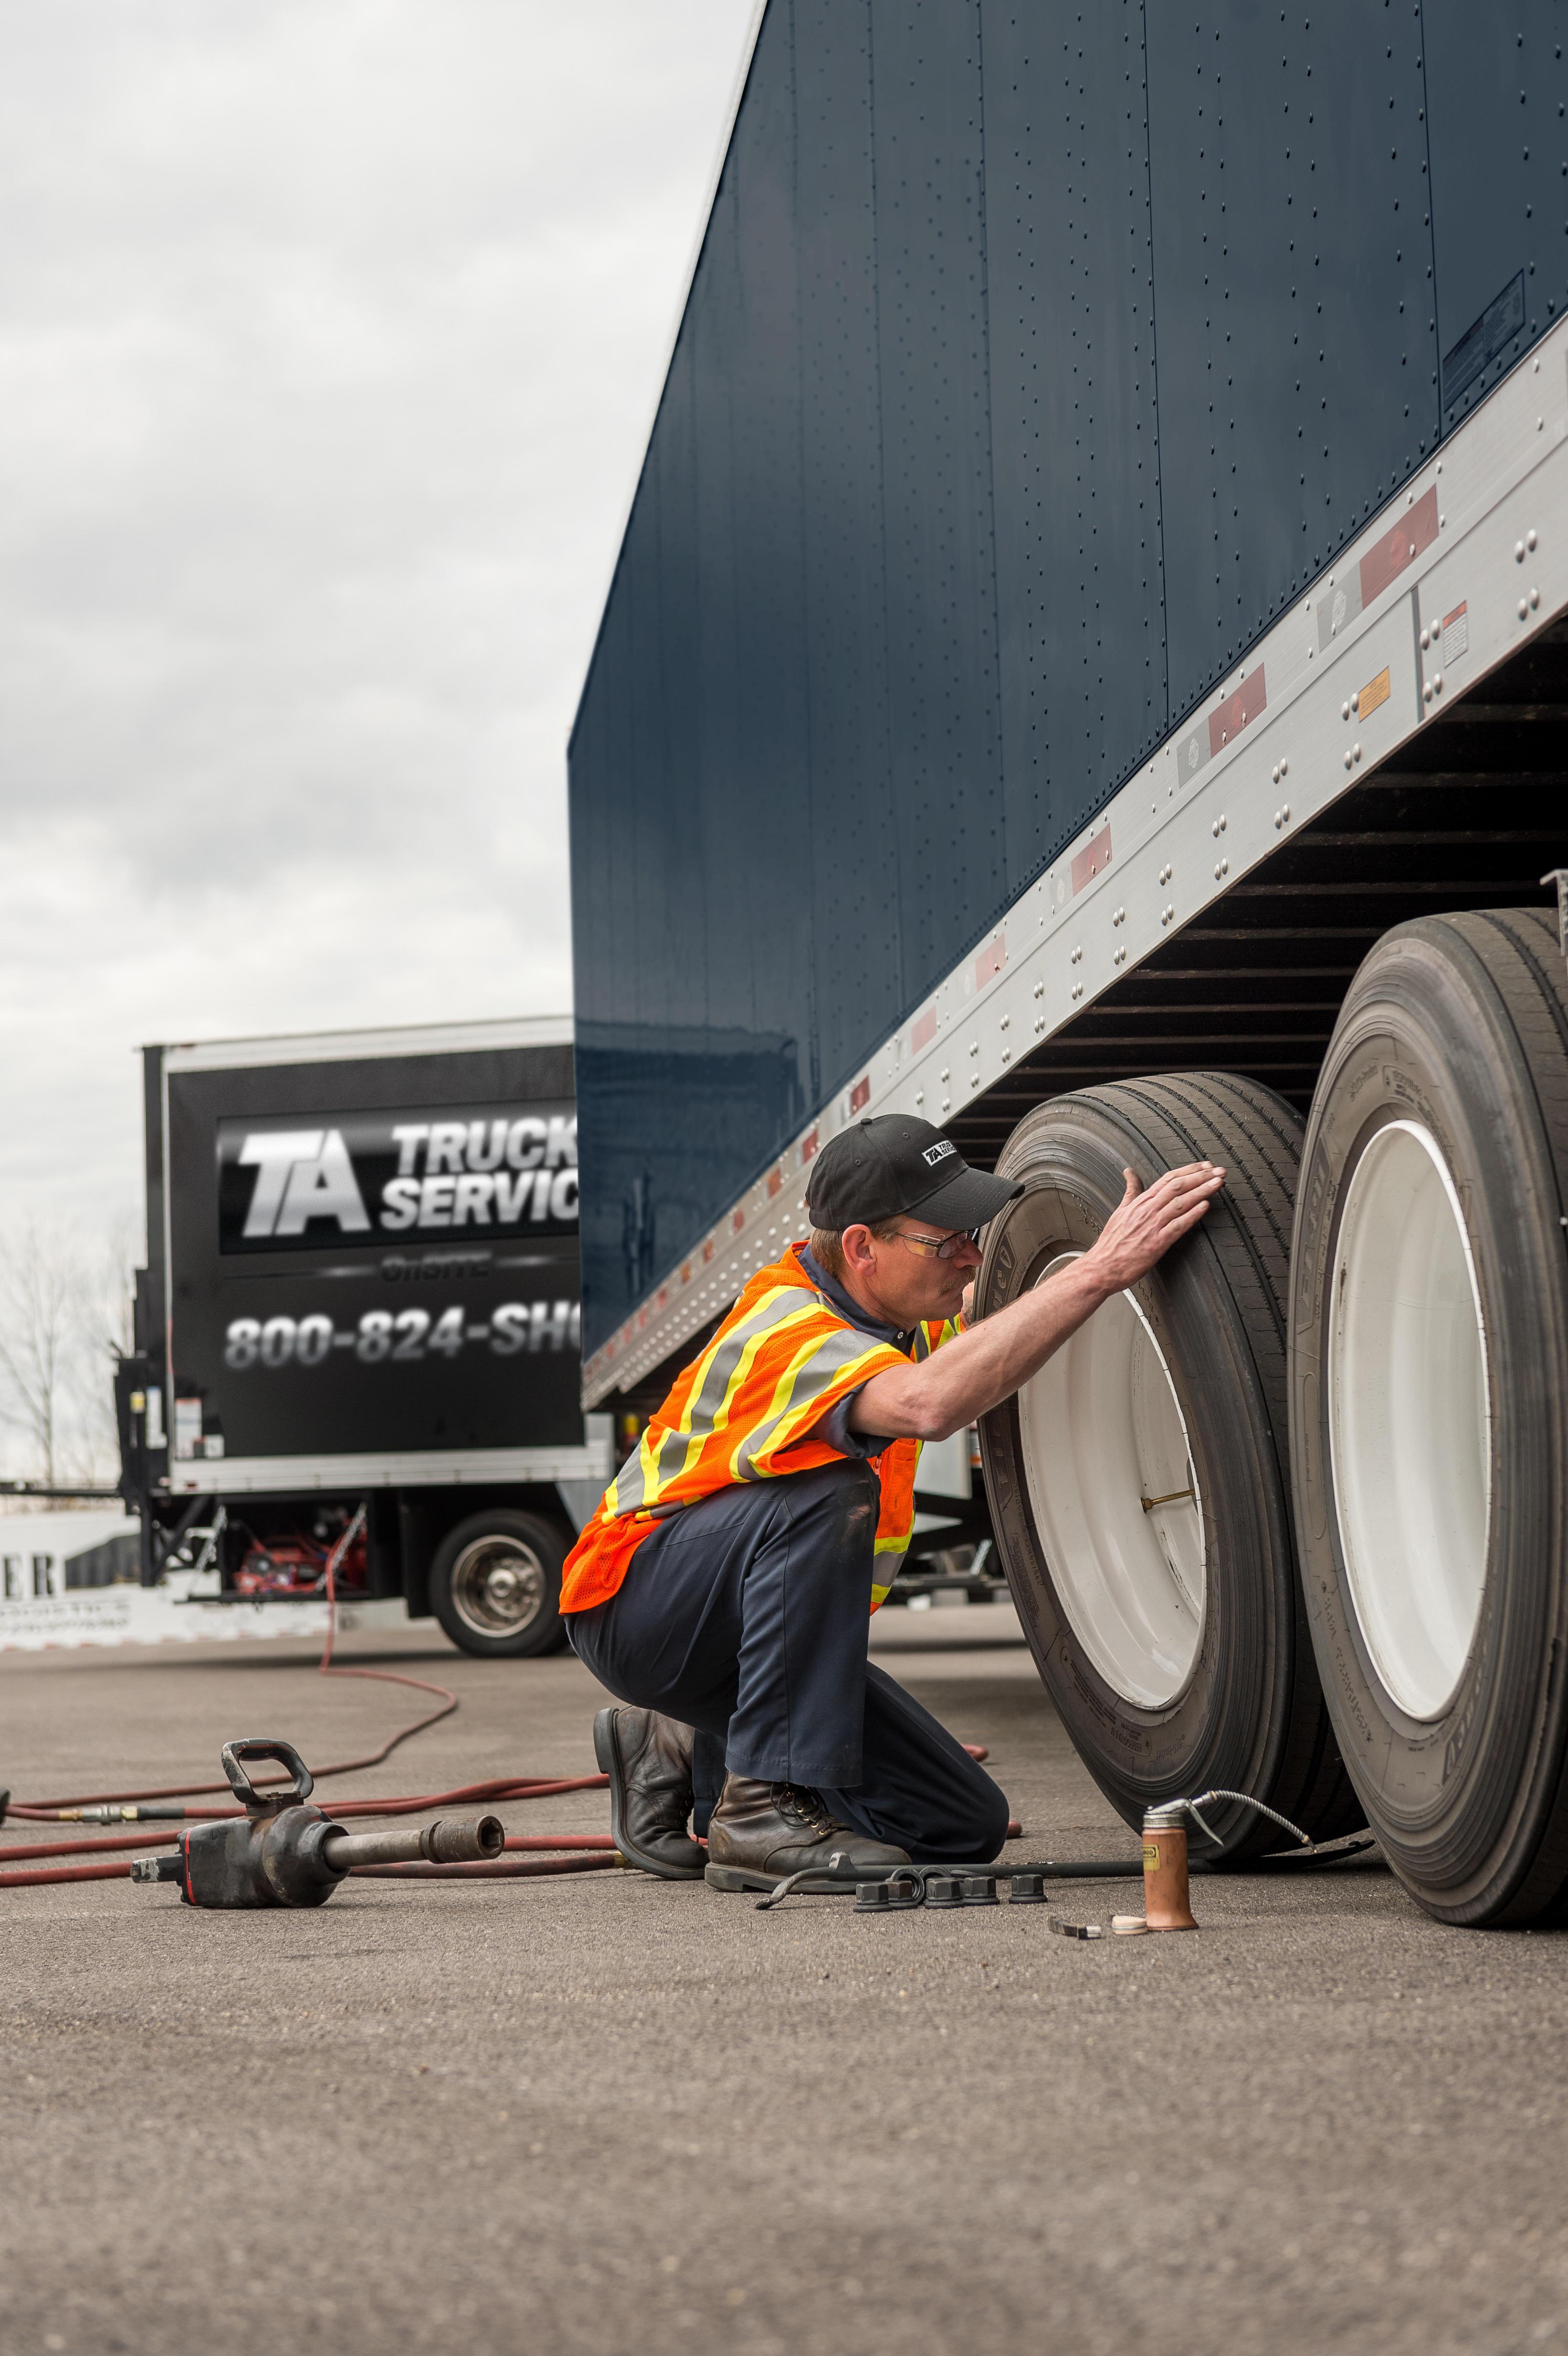 TA Truck Service image 2